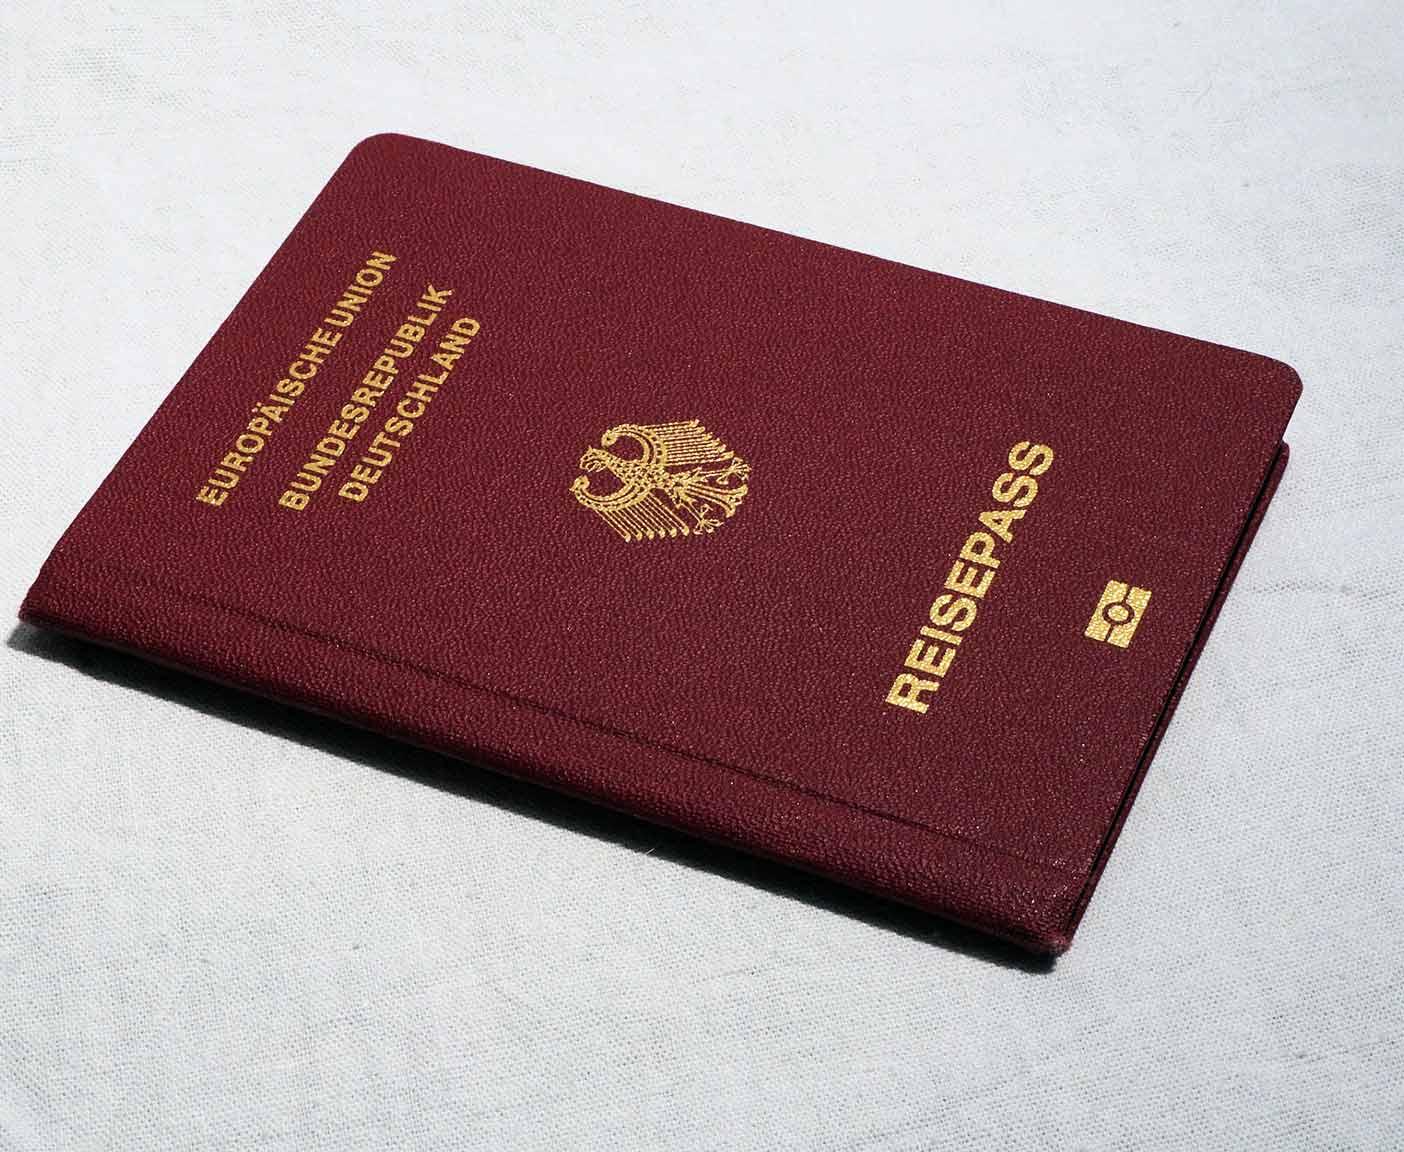 Mongolei-visum-visa-urlaub-china-russland-auswaertiges-amt